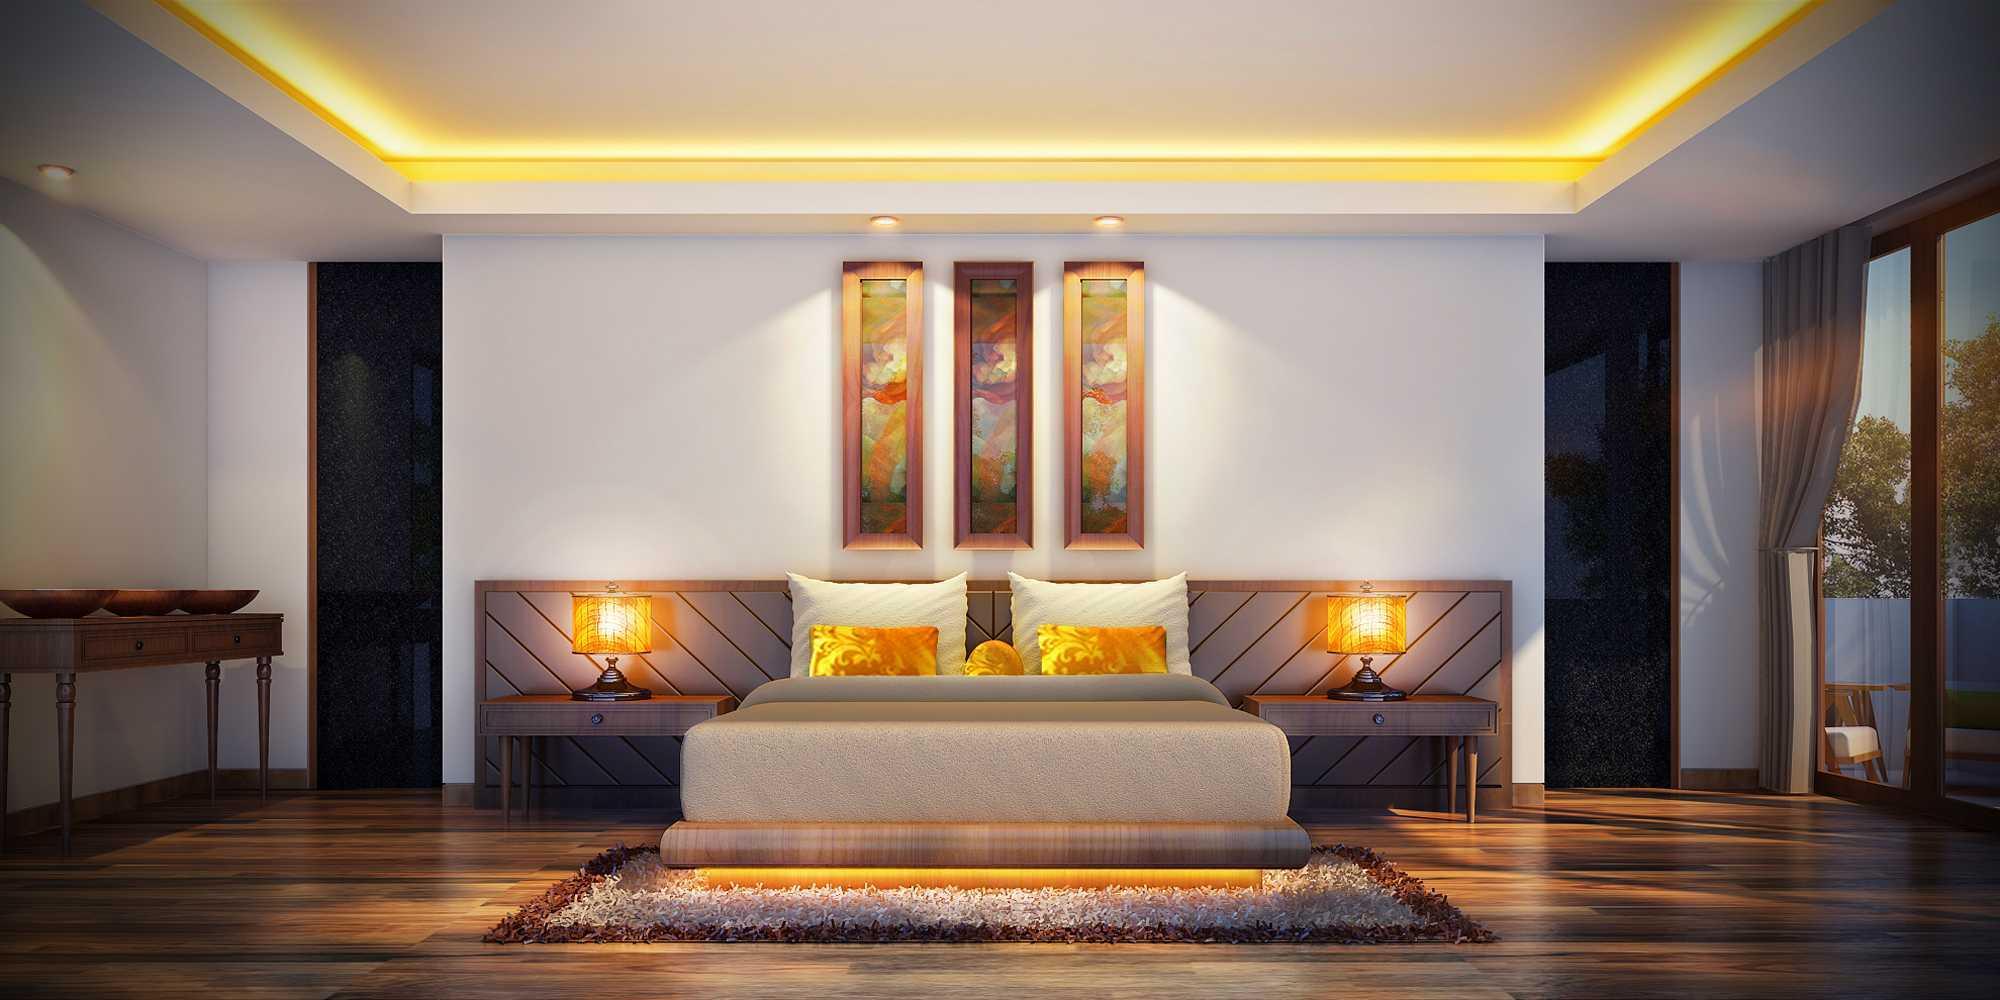 Icds Architect Pejeng Villa Bali Bali Bedroom   13931